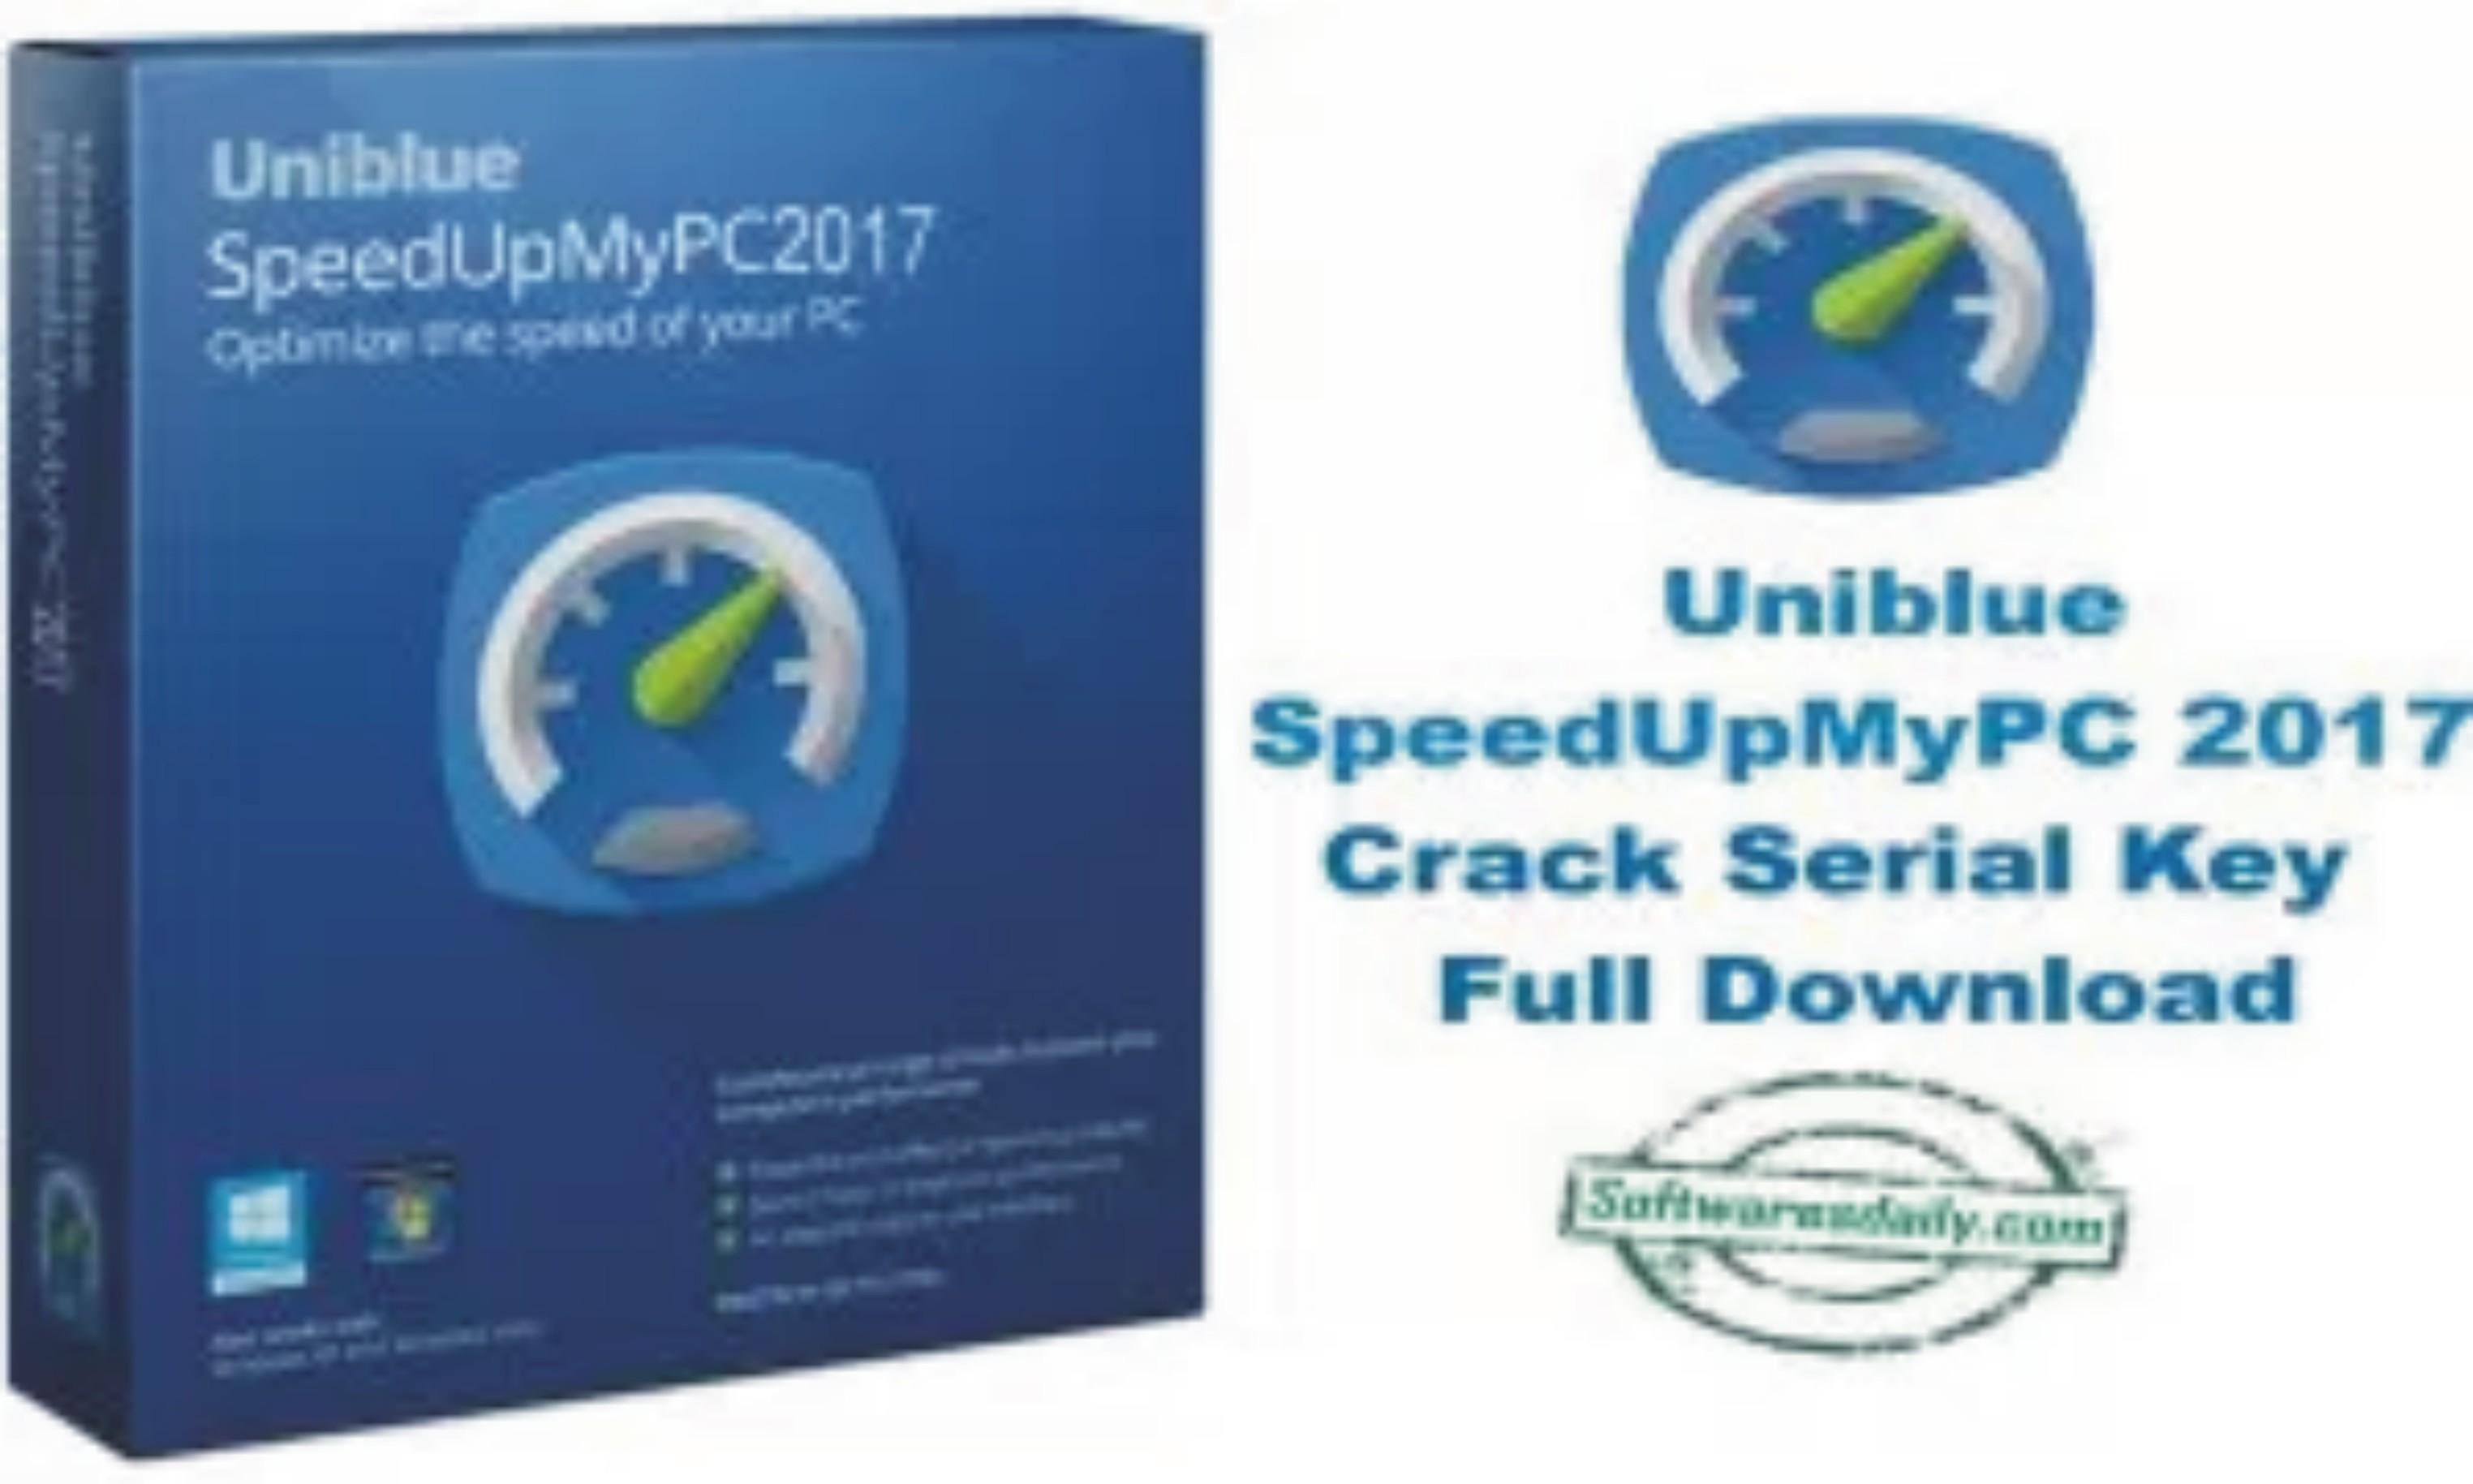 Uniblue SpeedUpMyPC 2017 Crack Serial Key Full Download